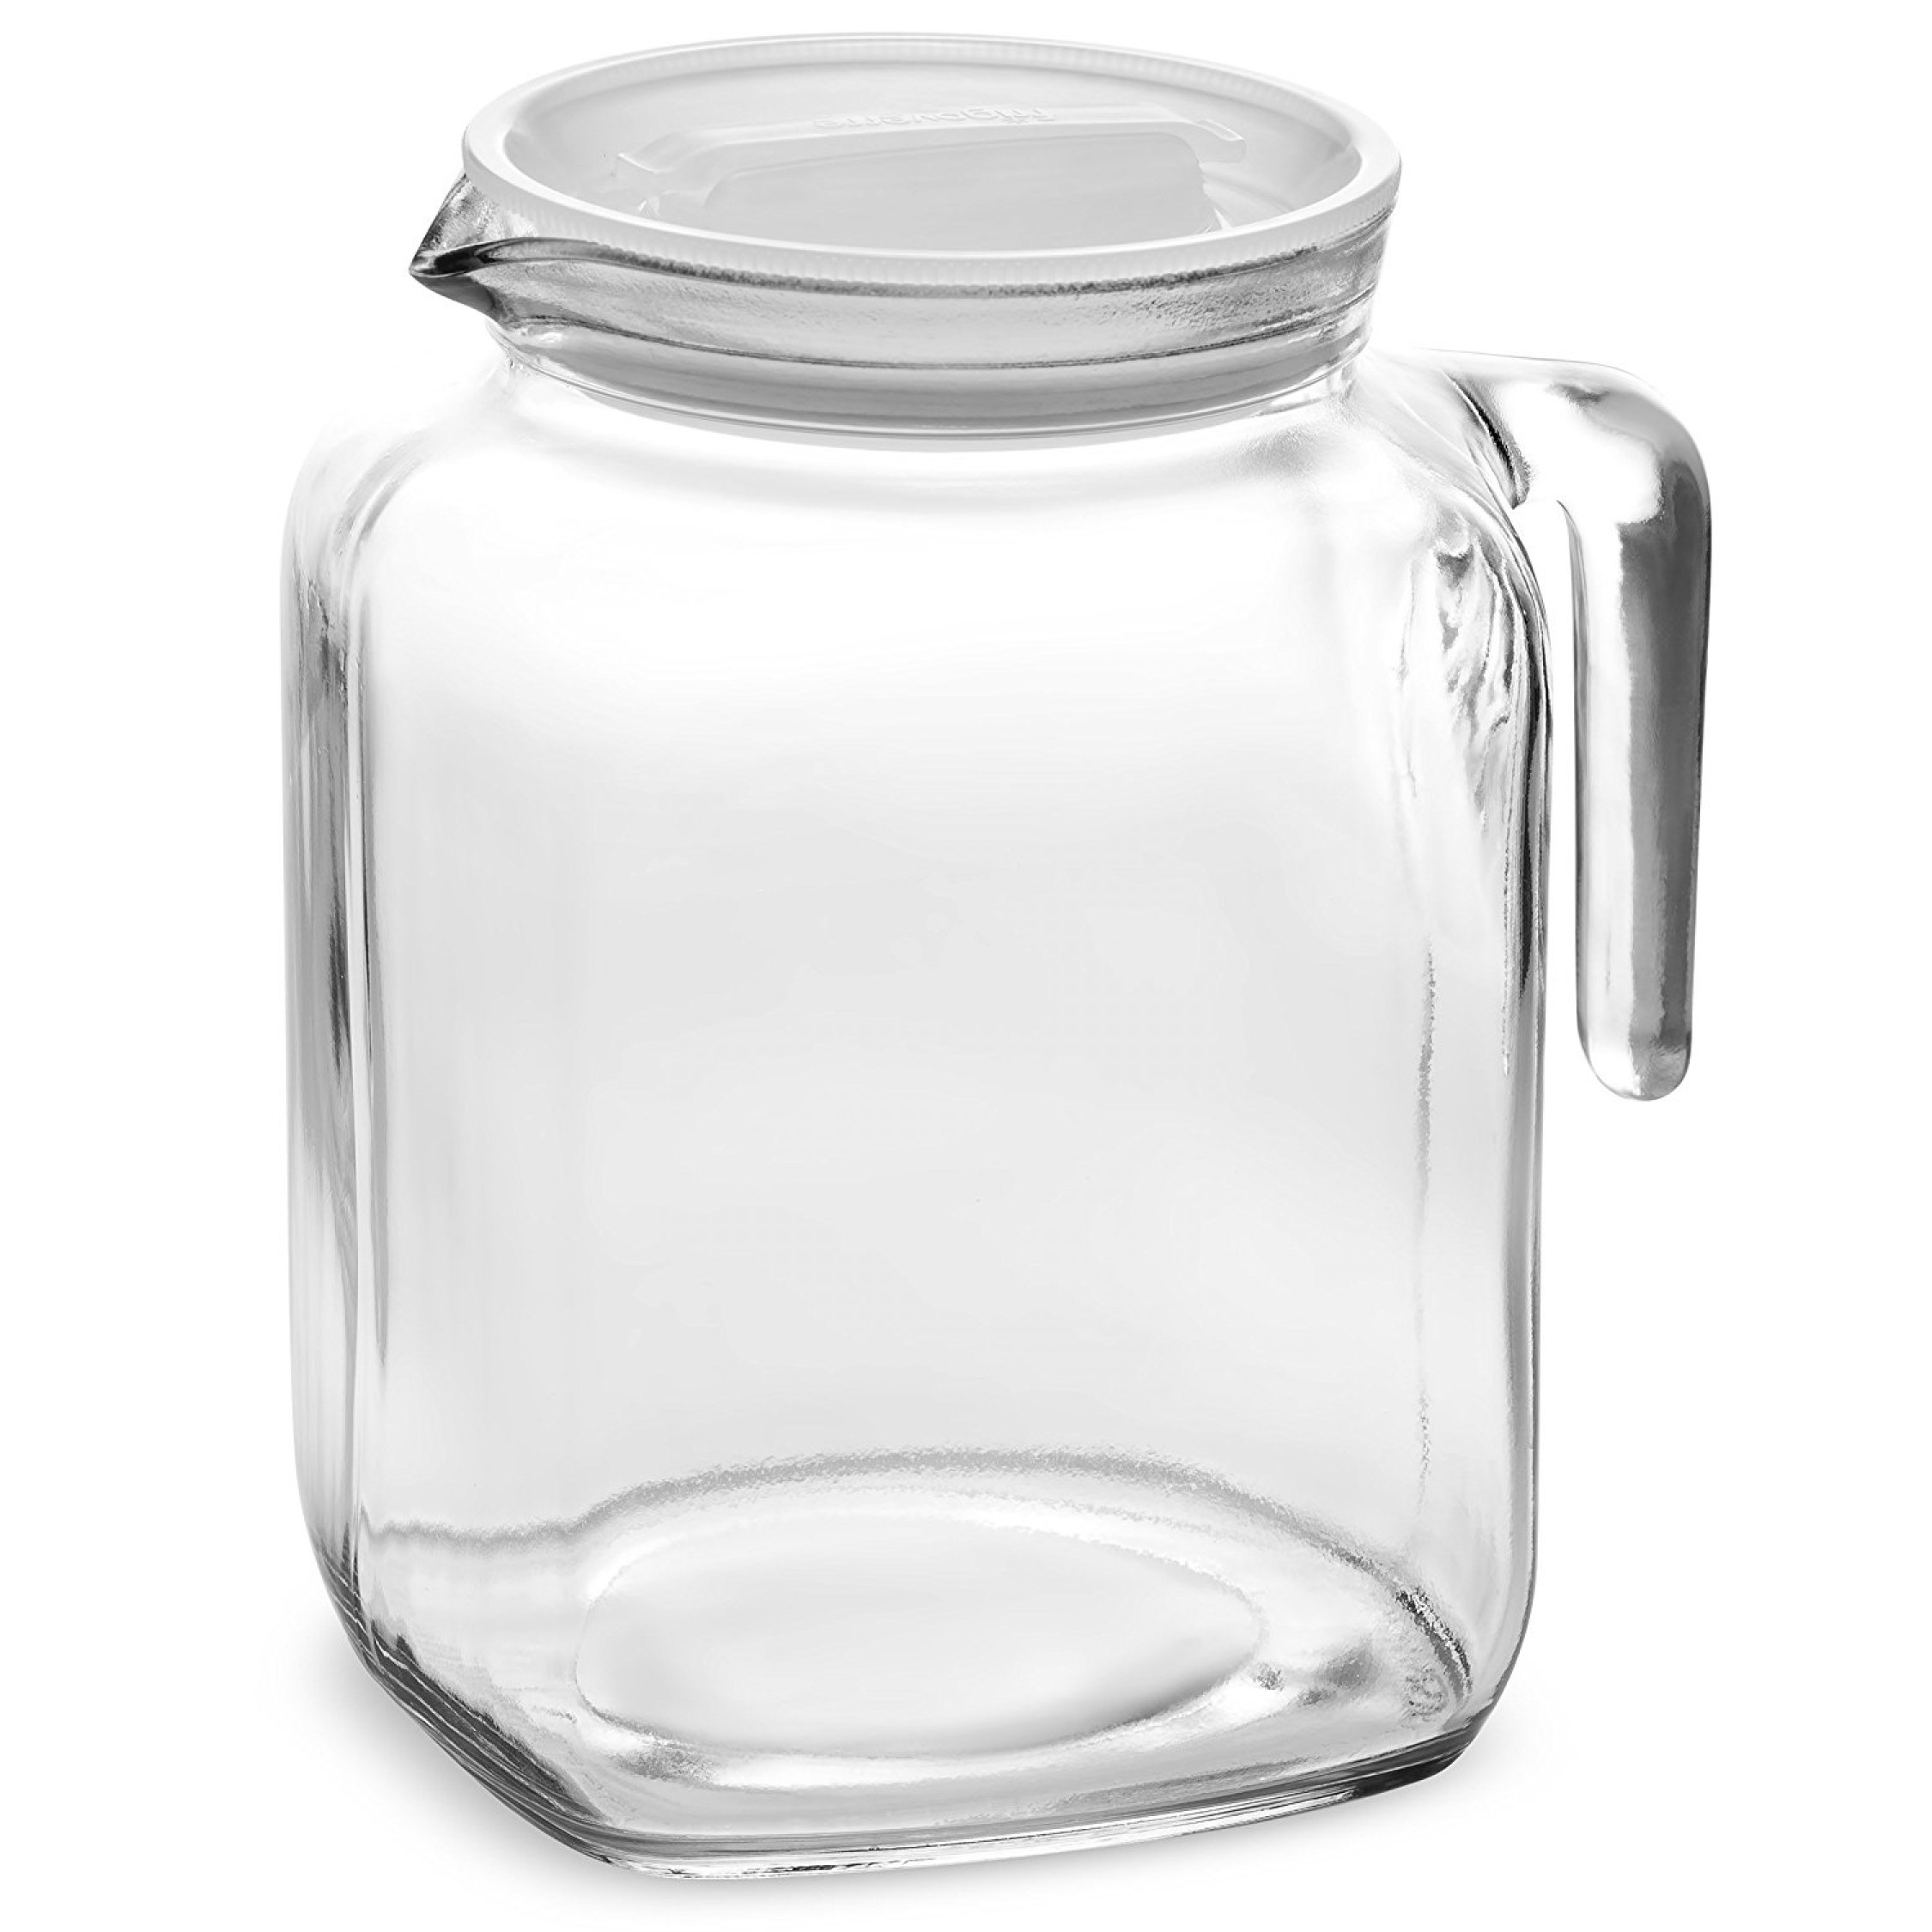 Square Gl Pitcher Bottle Lid Spout Milk Beverage